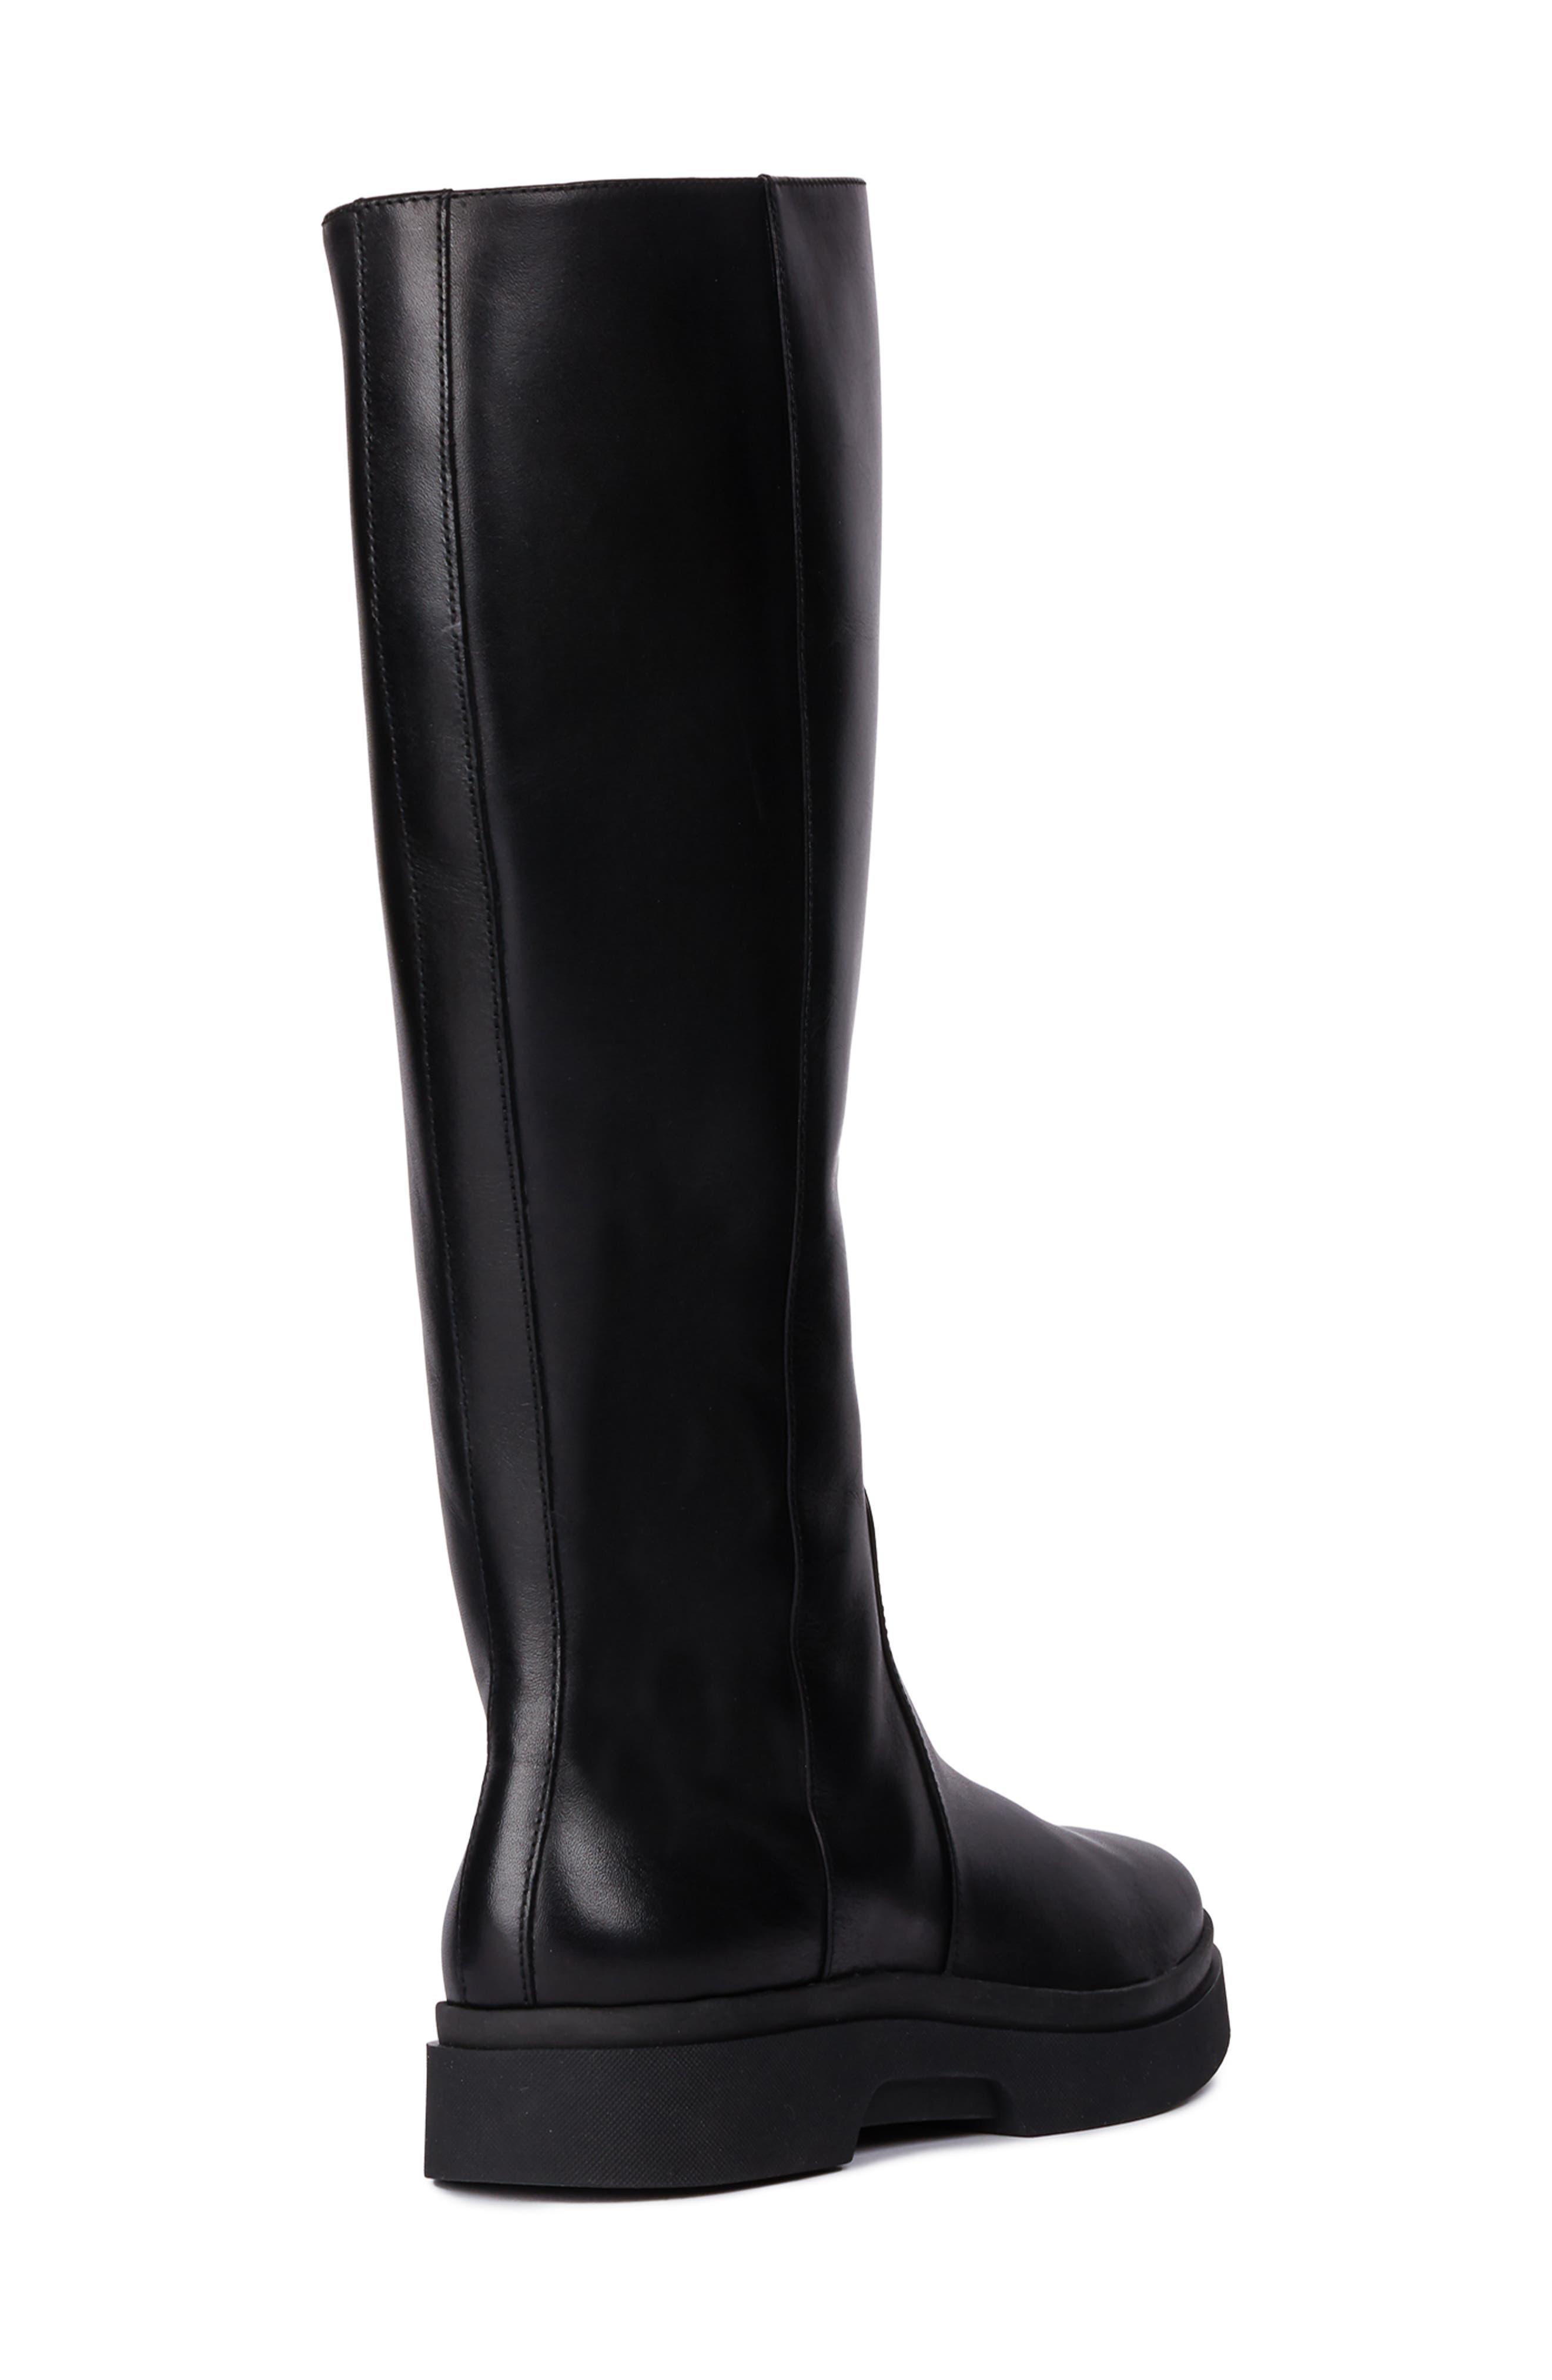 Myluse Knee High Platform Boot,                             Alternate thumbnail 2, color,                             BLACK LEATHER